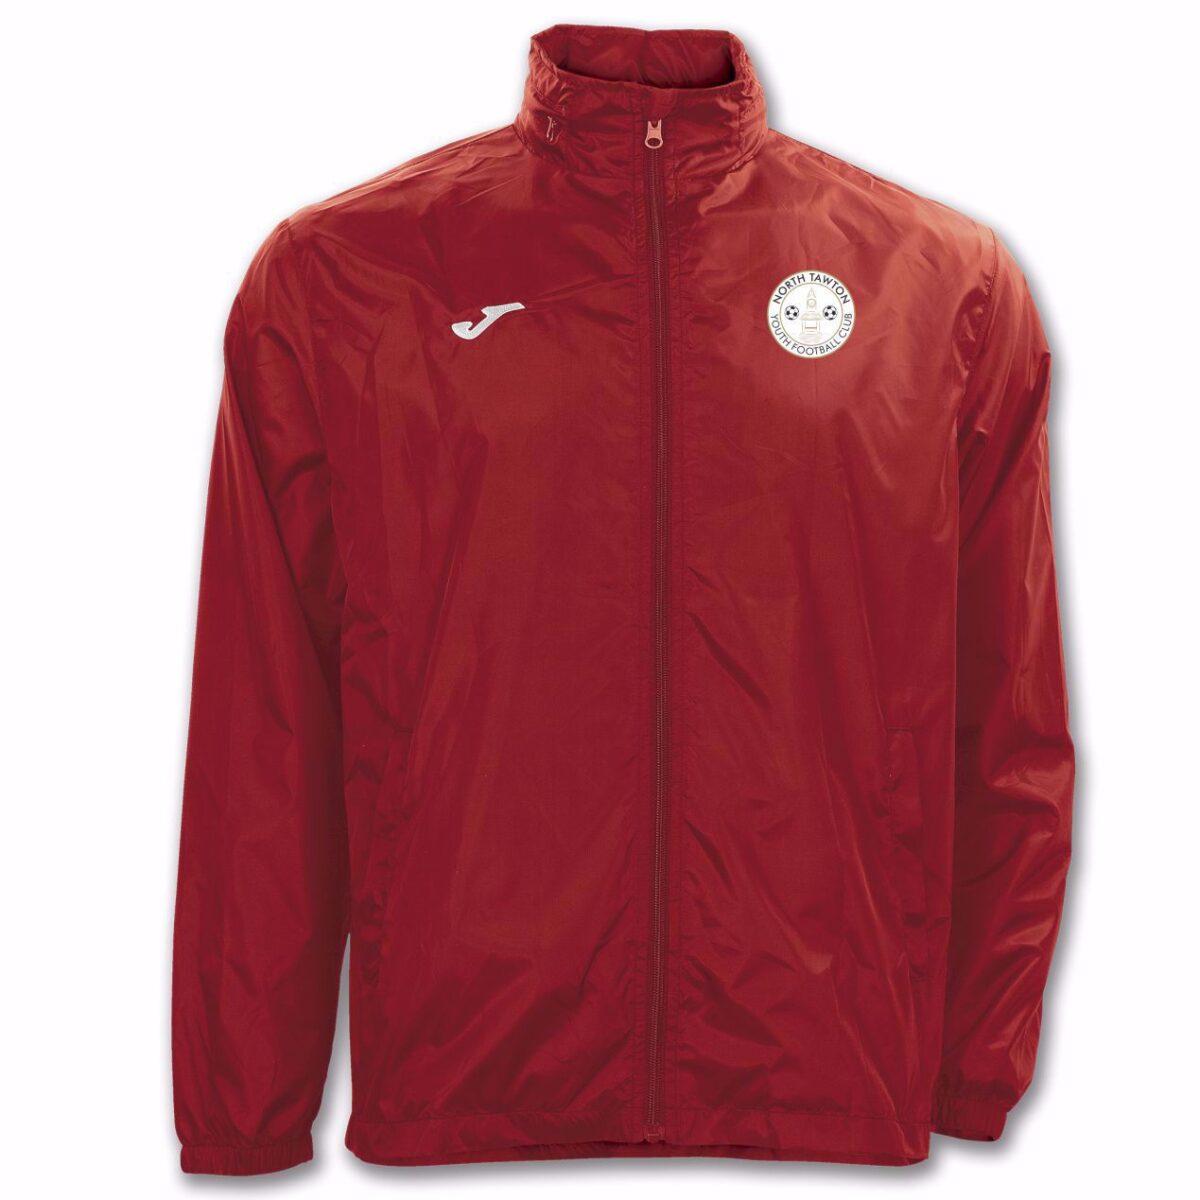 North Tawton Youth Football Club IRIS Rain Jacket 100087600 - JUNIOR